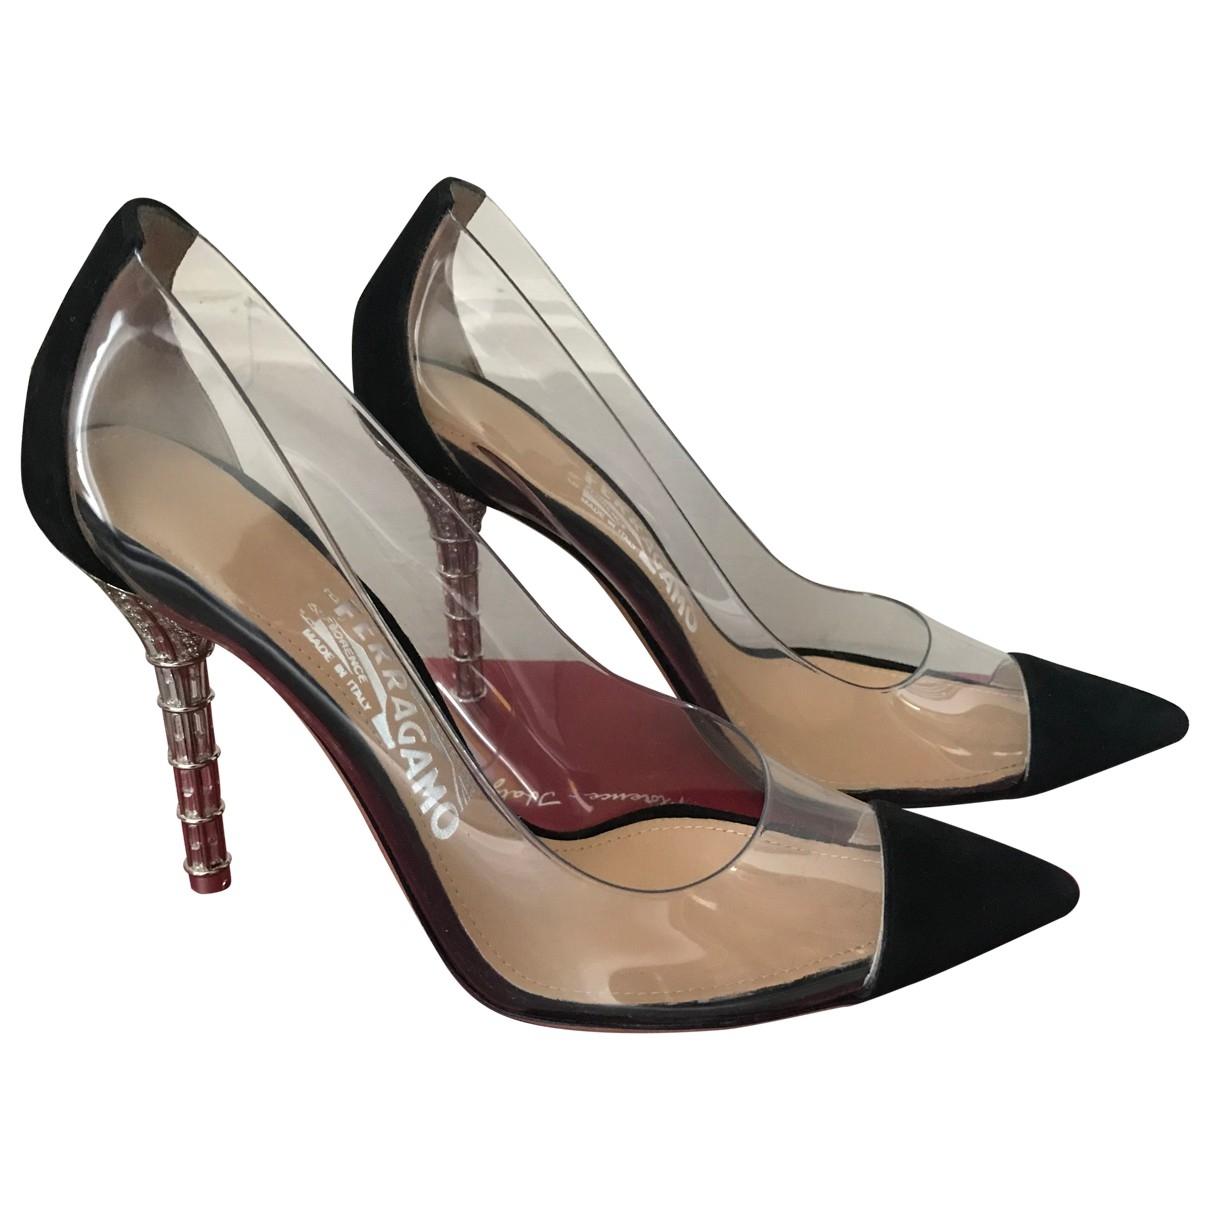 Salvatore Ferragamo \N Black Suede Heels for Women 36.5 EU